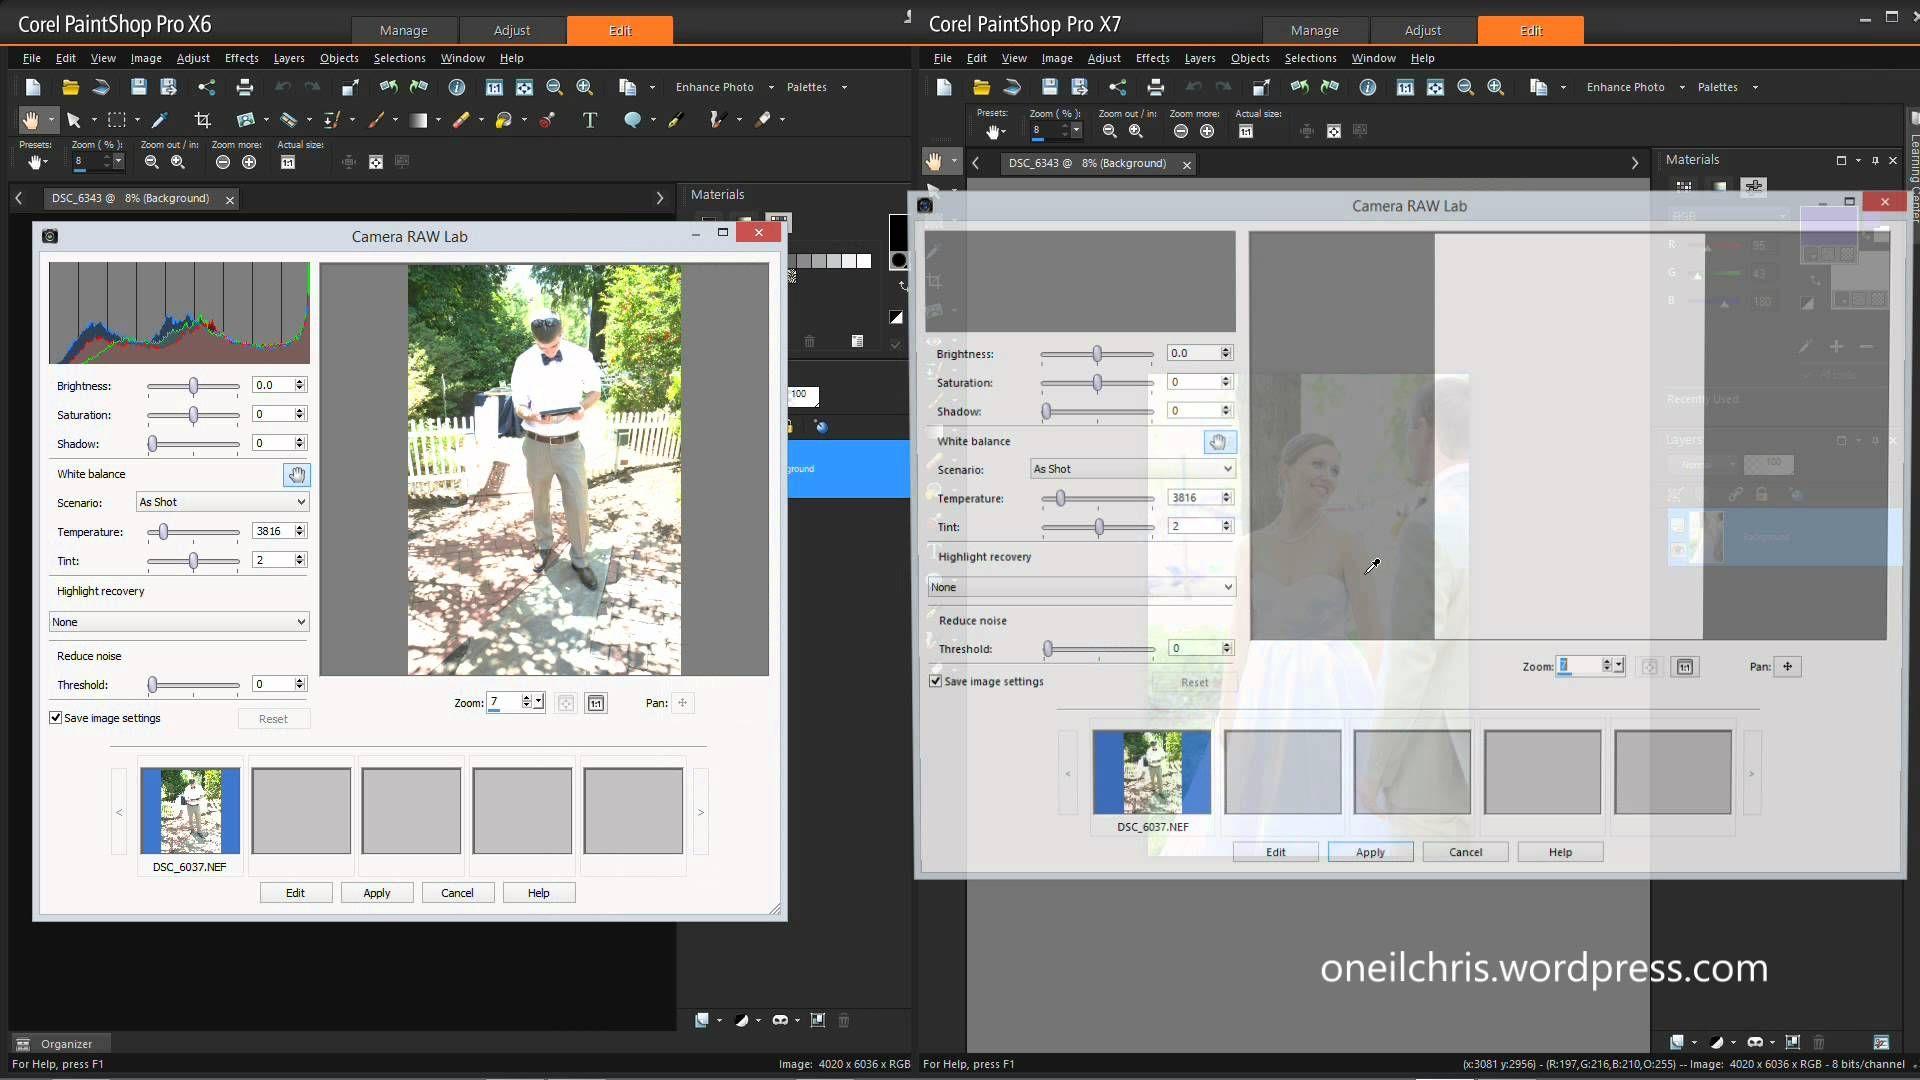 Medium Crop Of Paintshop Pro X7